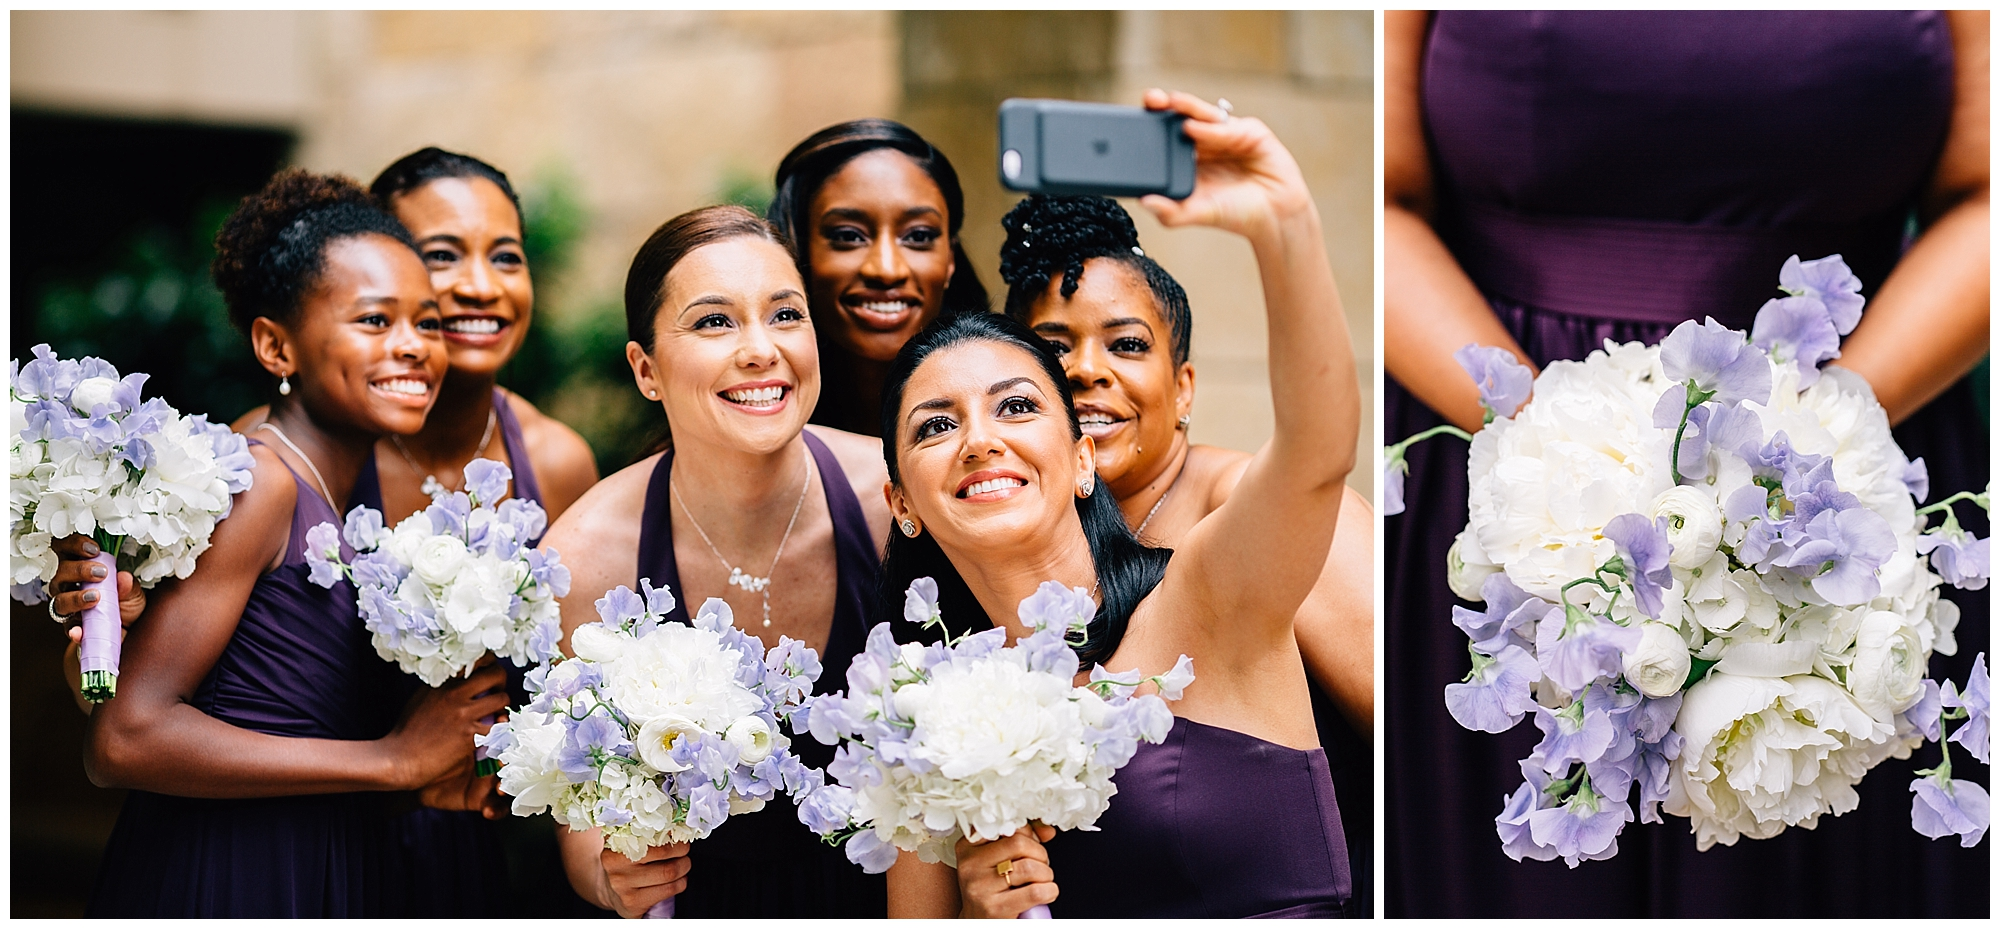 Umstead-wedding-photographer_0029.jpg